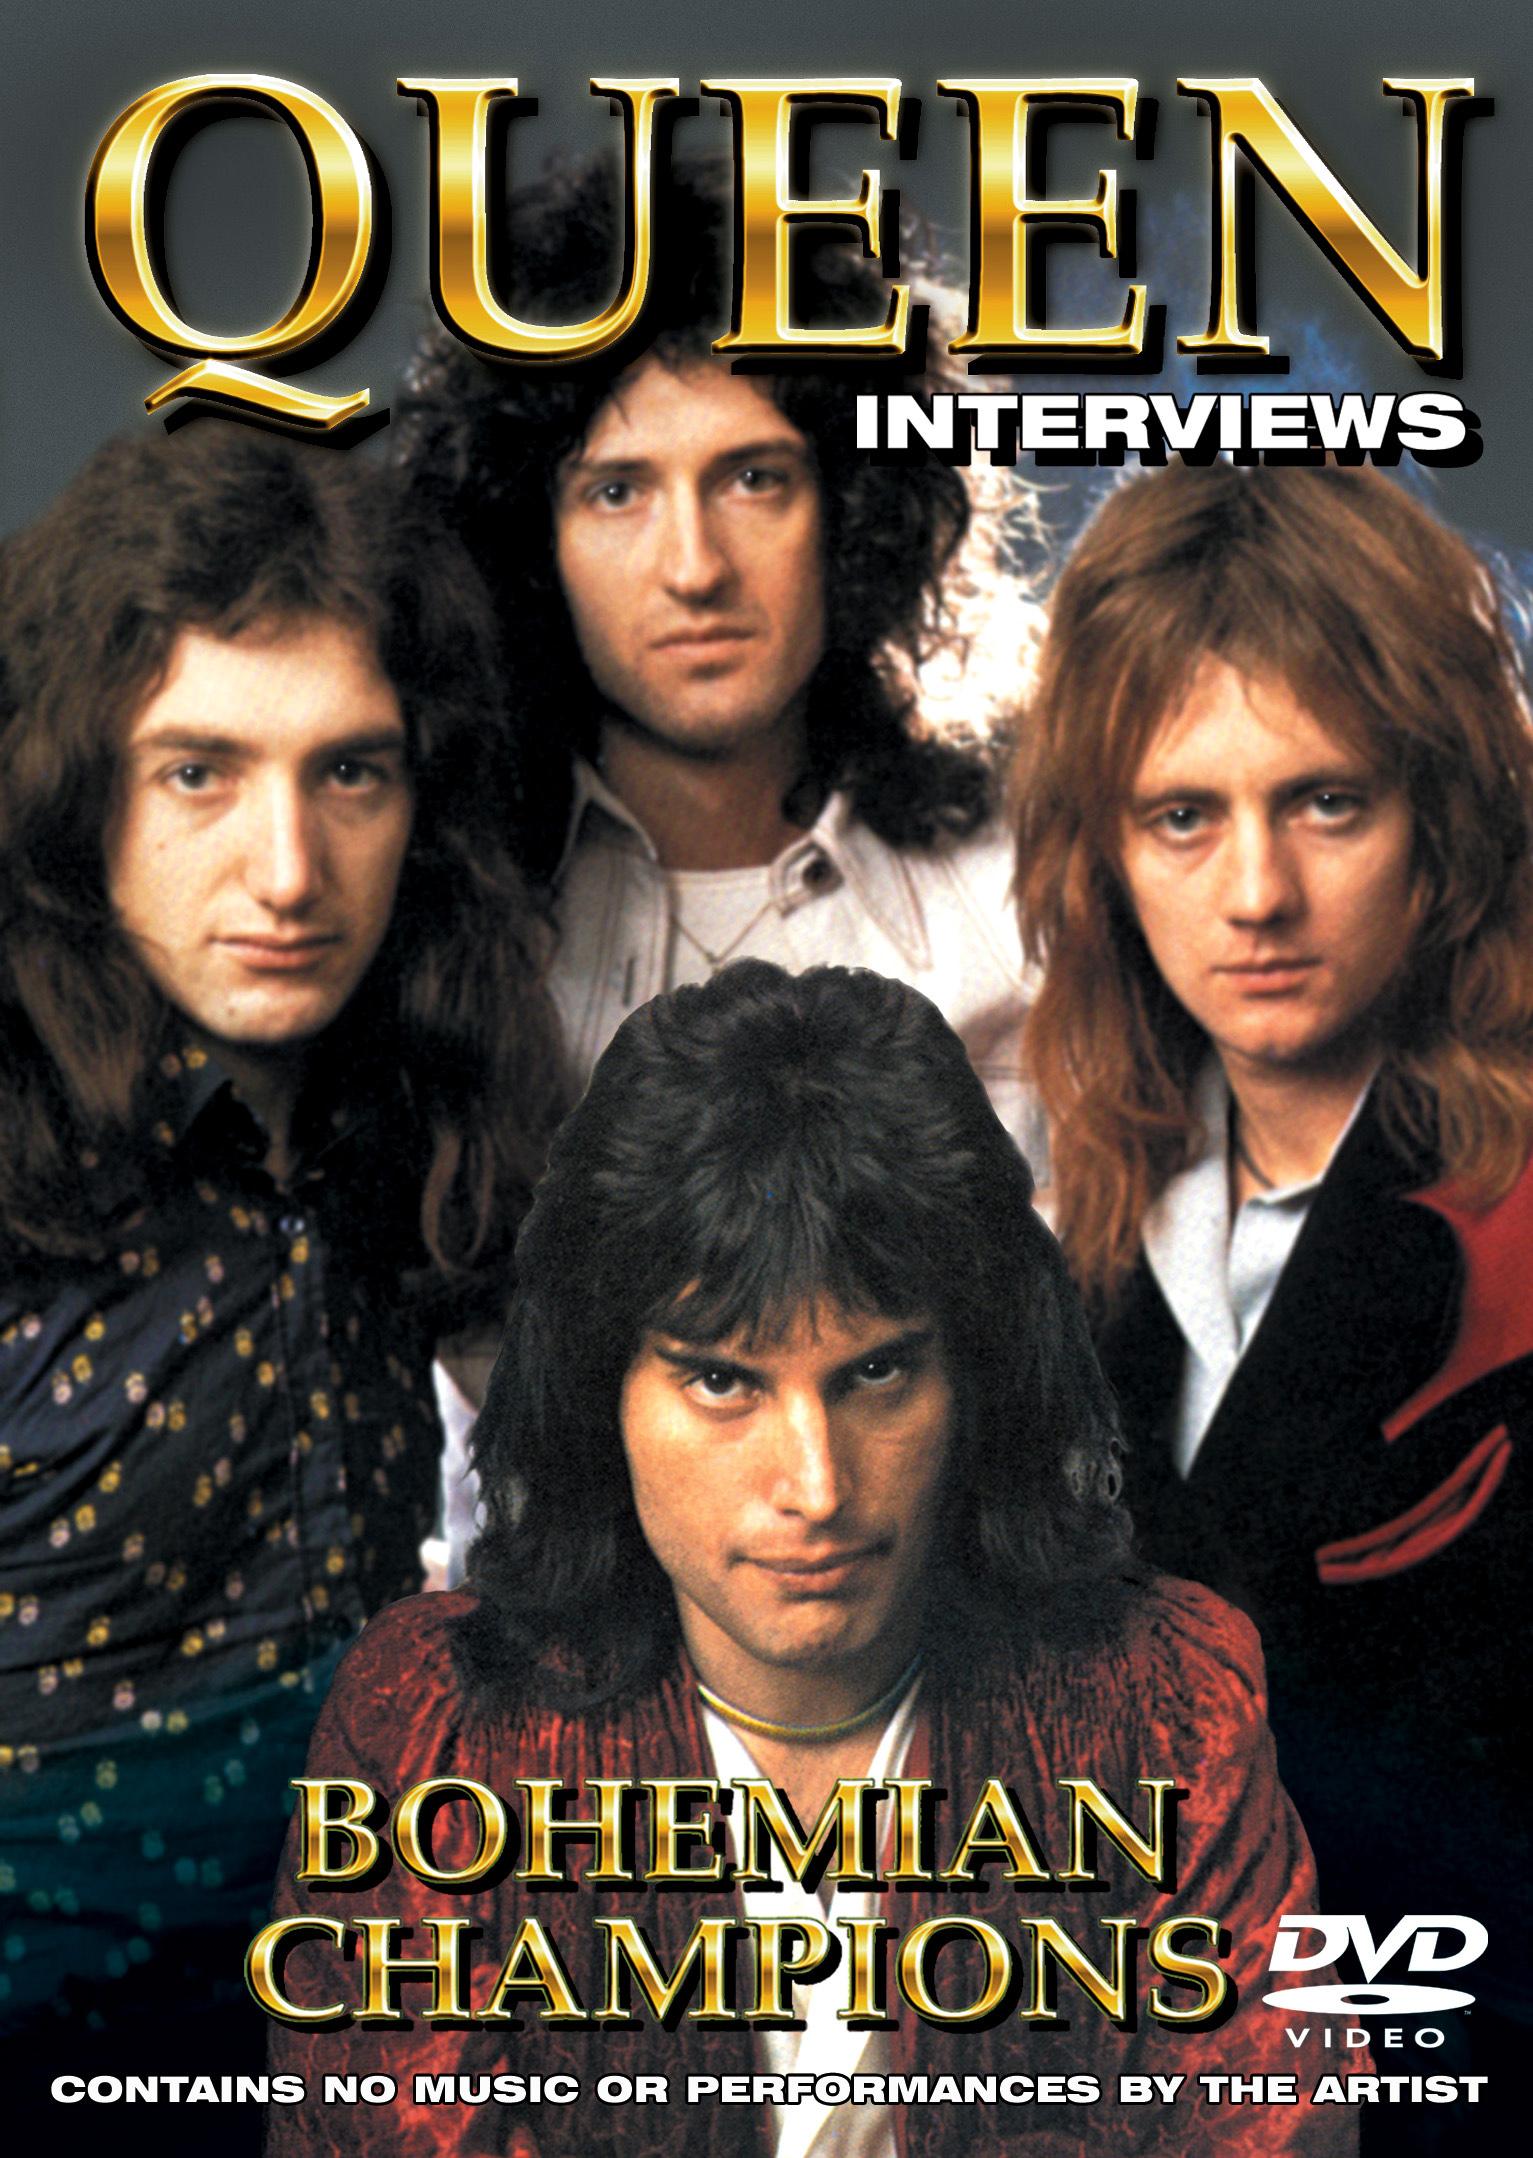 Queen: Bohemian Champions - Interviews